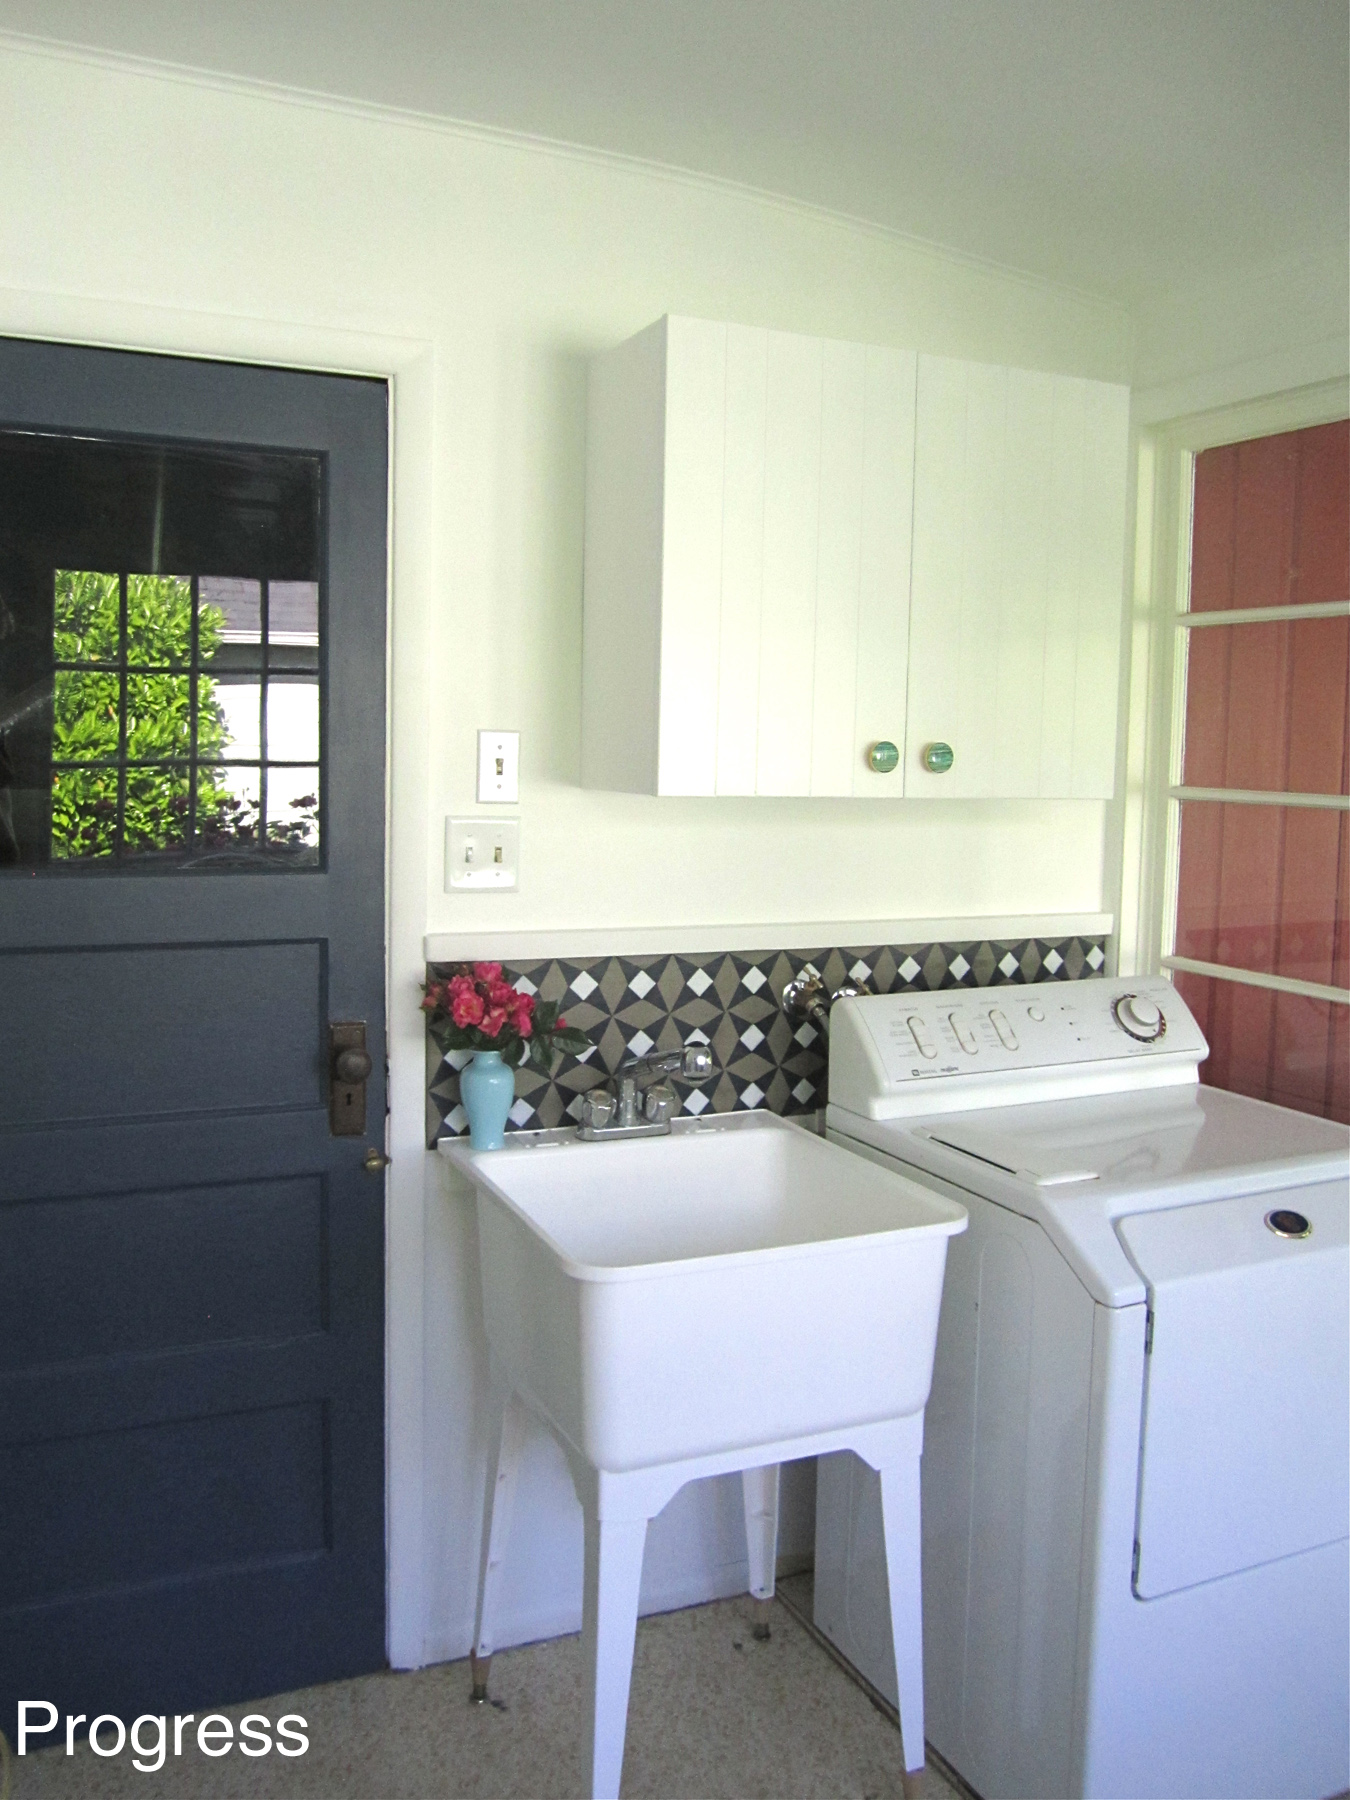 Laundry Room Progress with DIY Concrete Backsplash